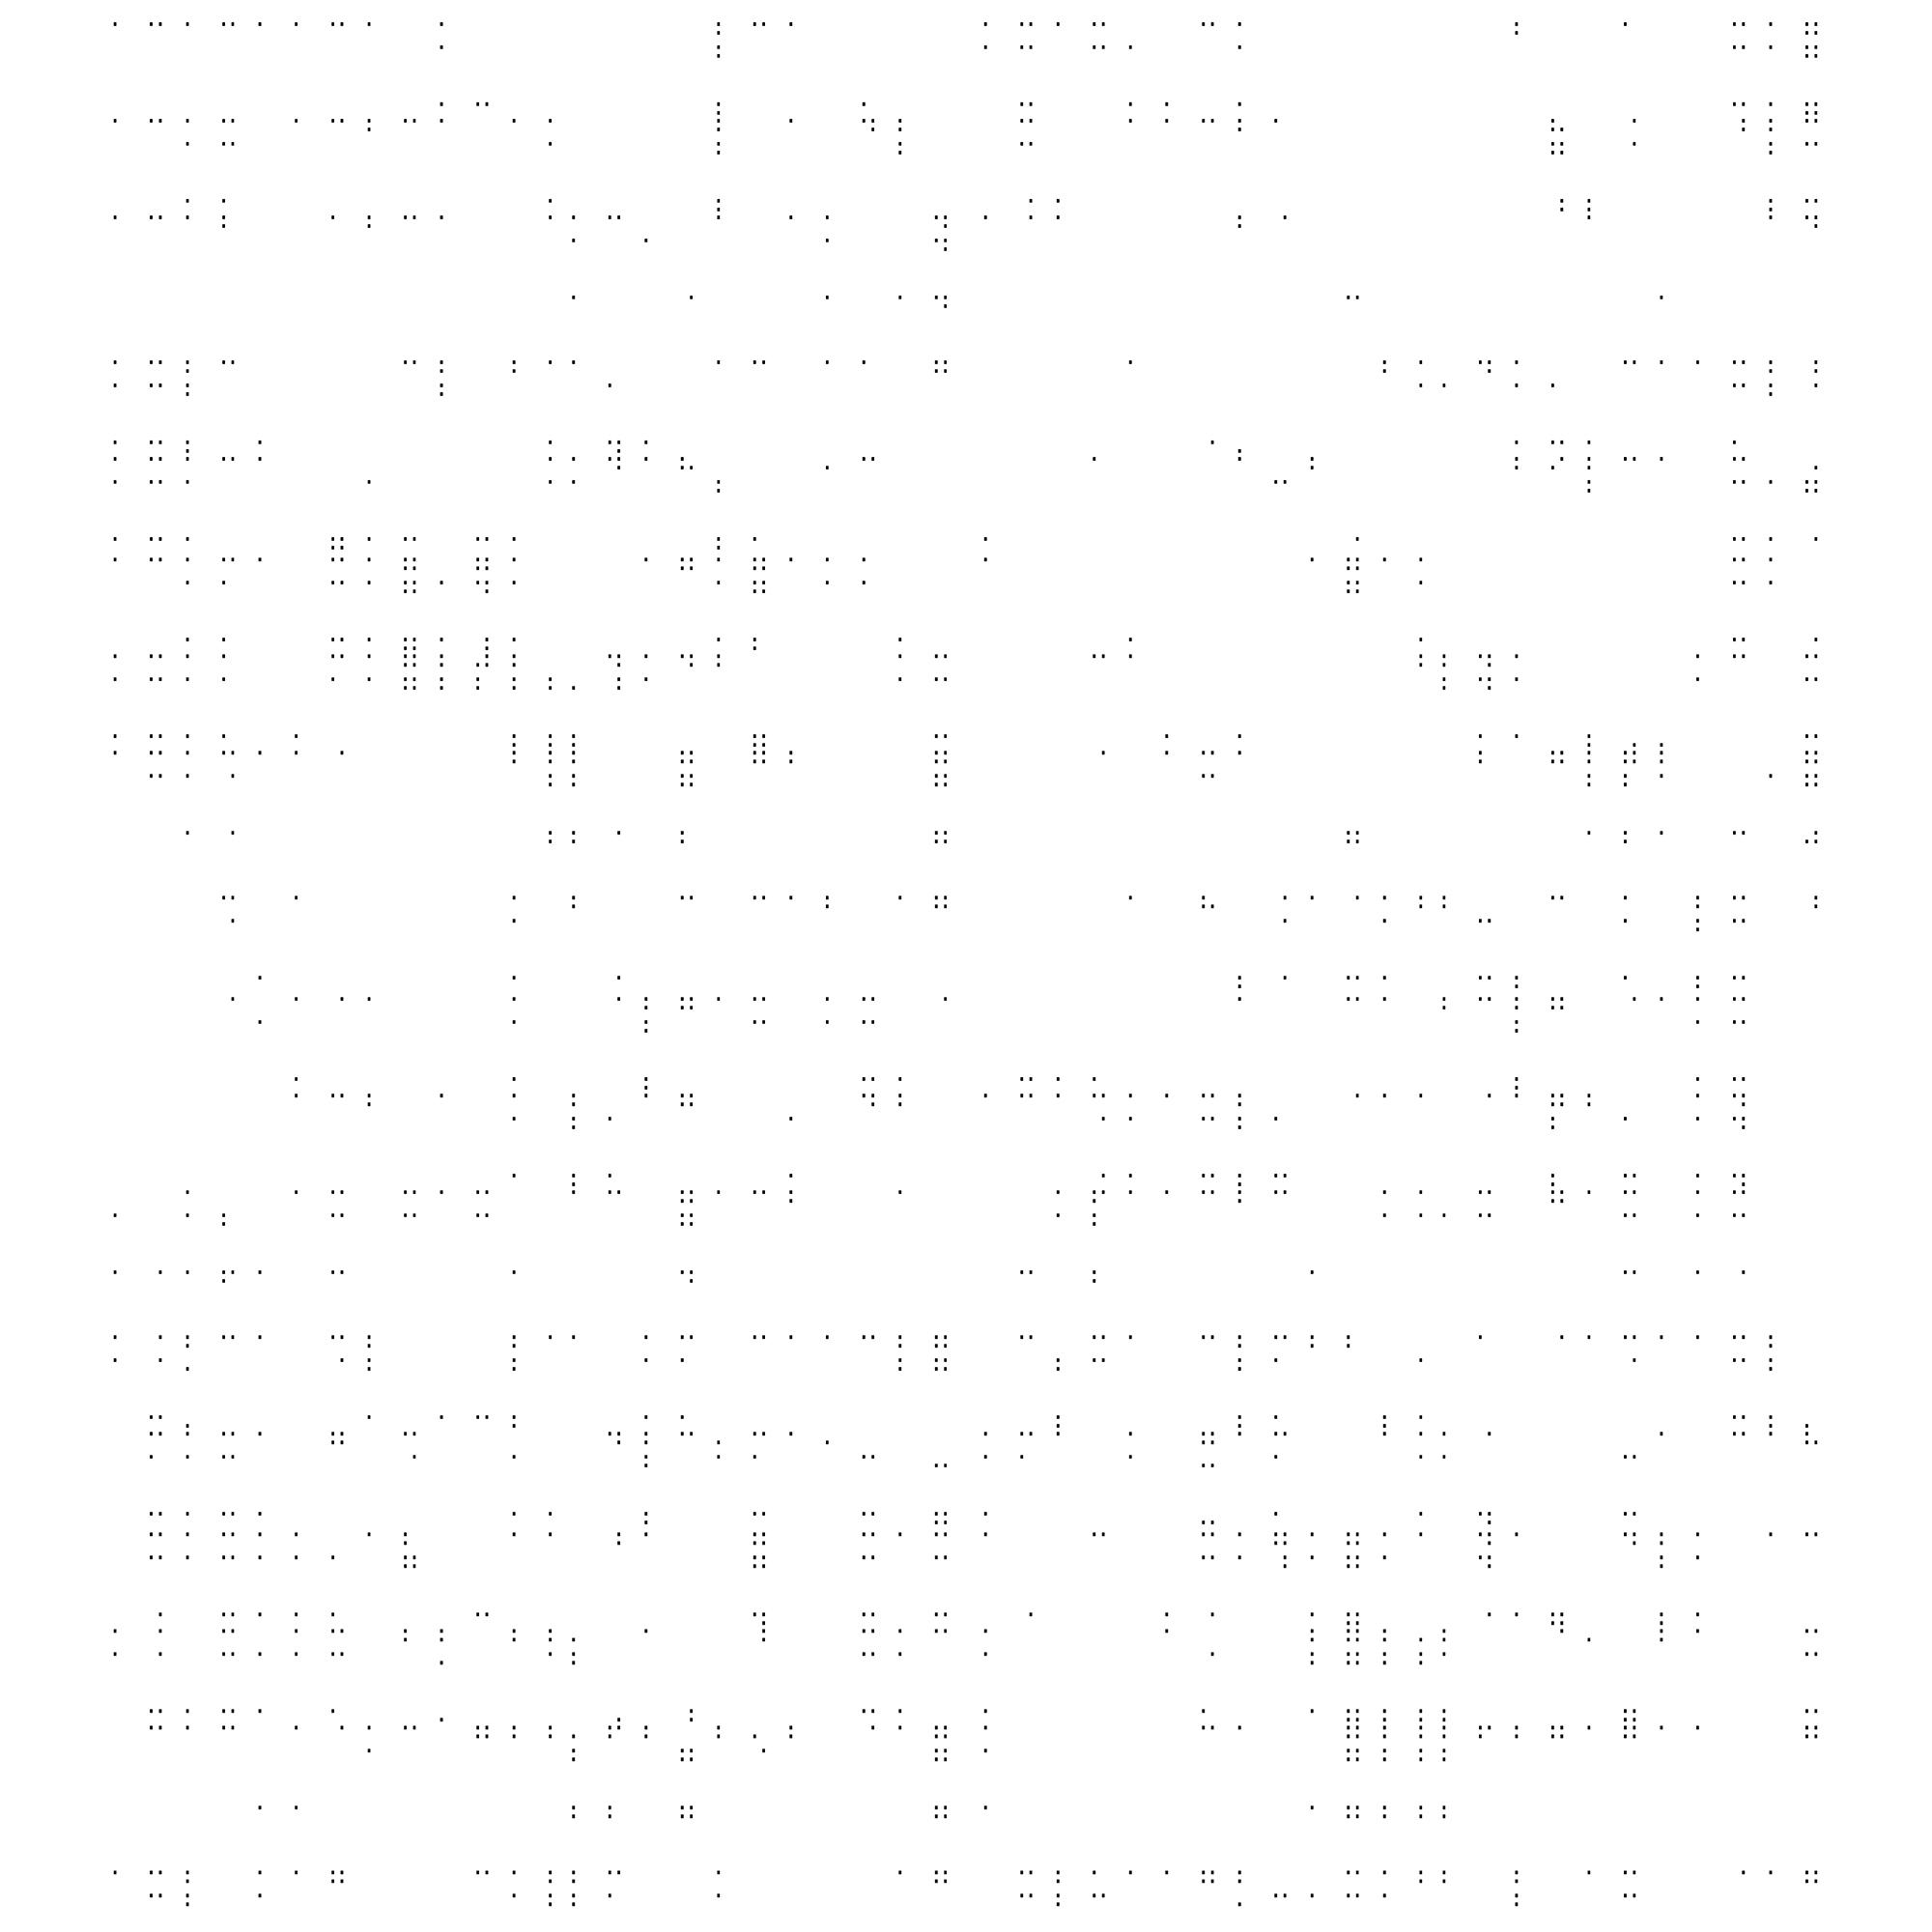 sheepairsupport_FF10_8K (64).jpg